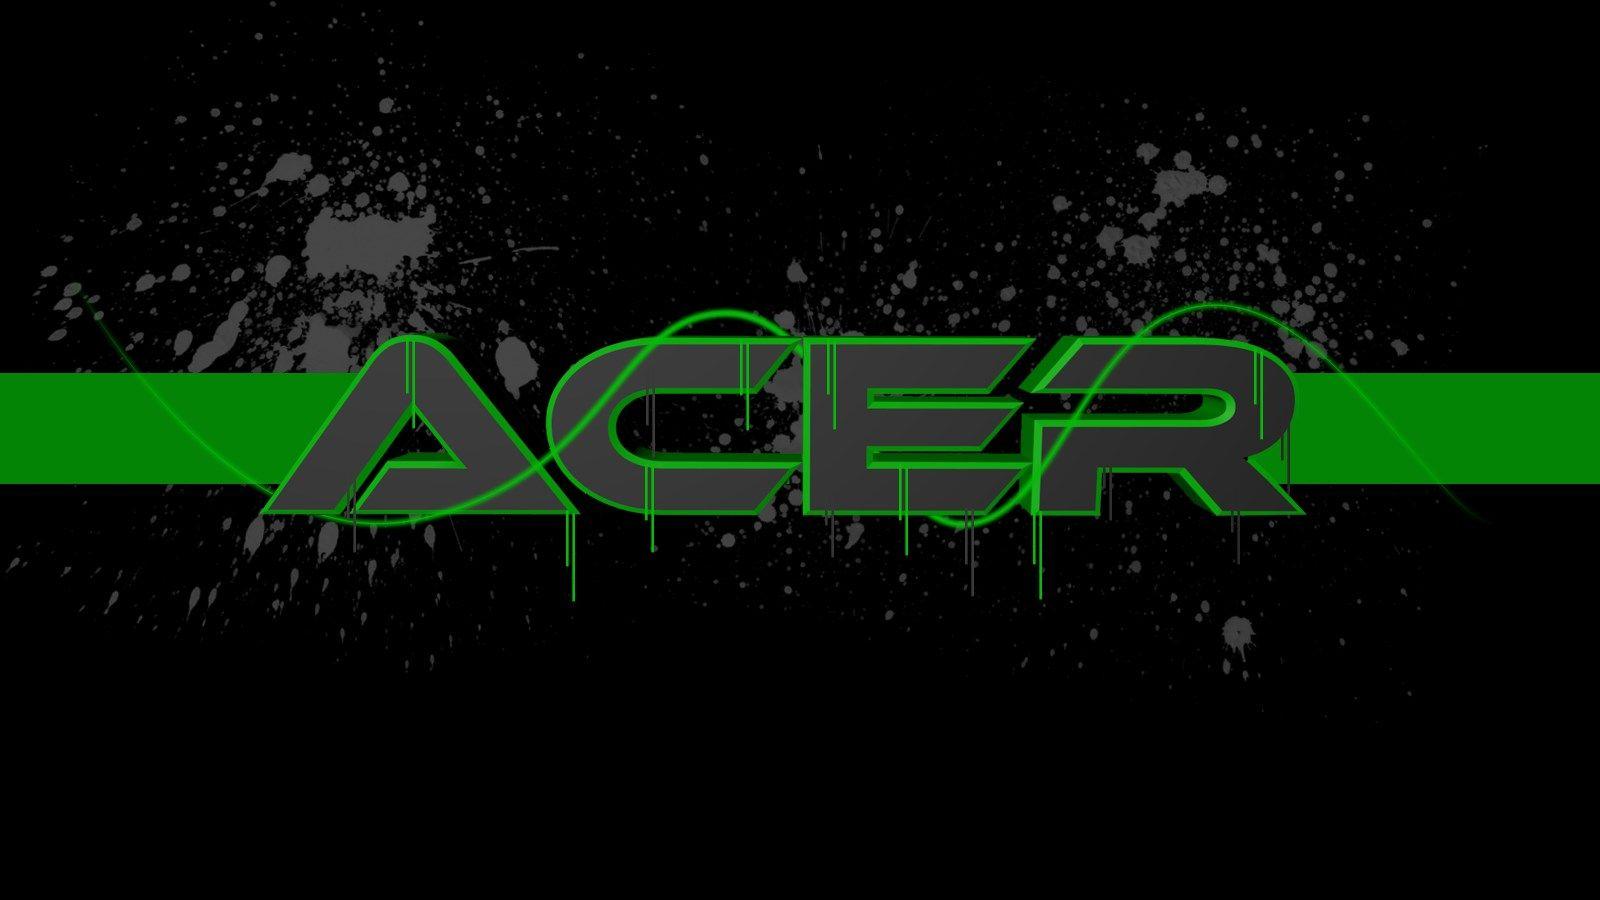 Acer For Desktop Hd Acer Desktop Wallpaper Pc Nba Wallpapers